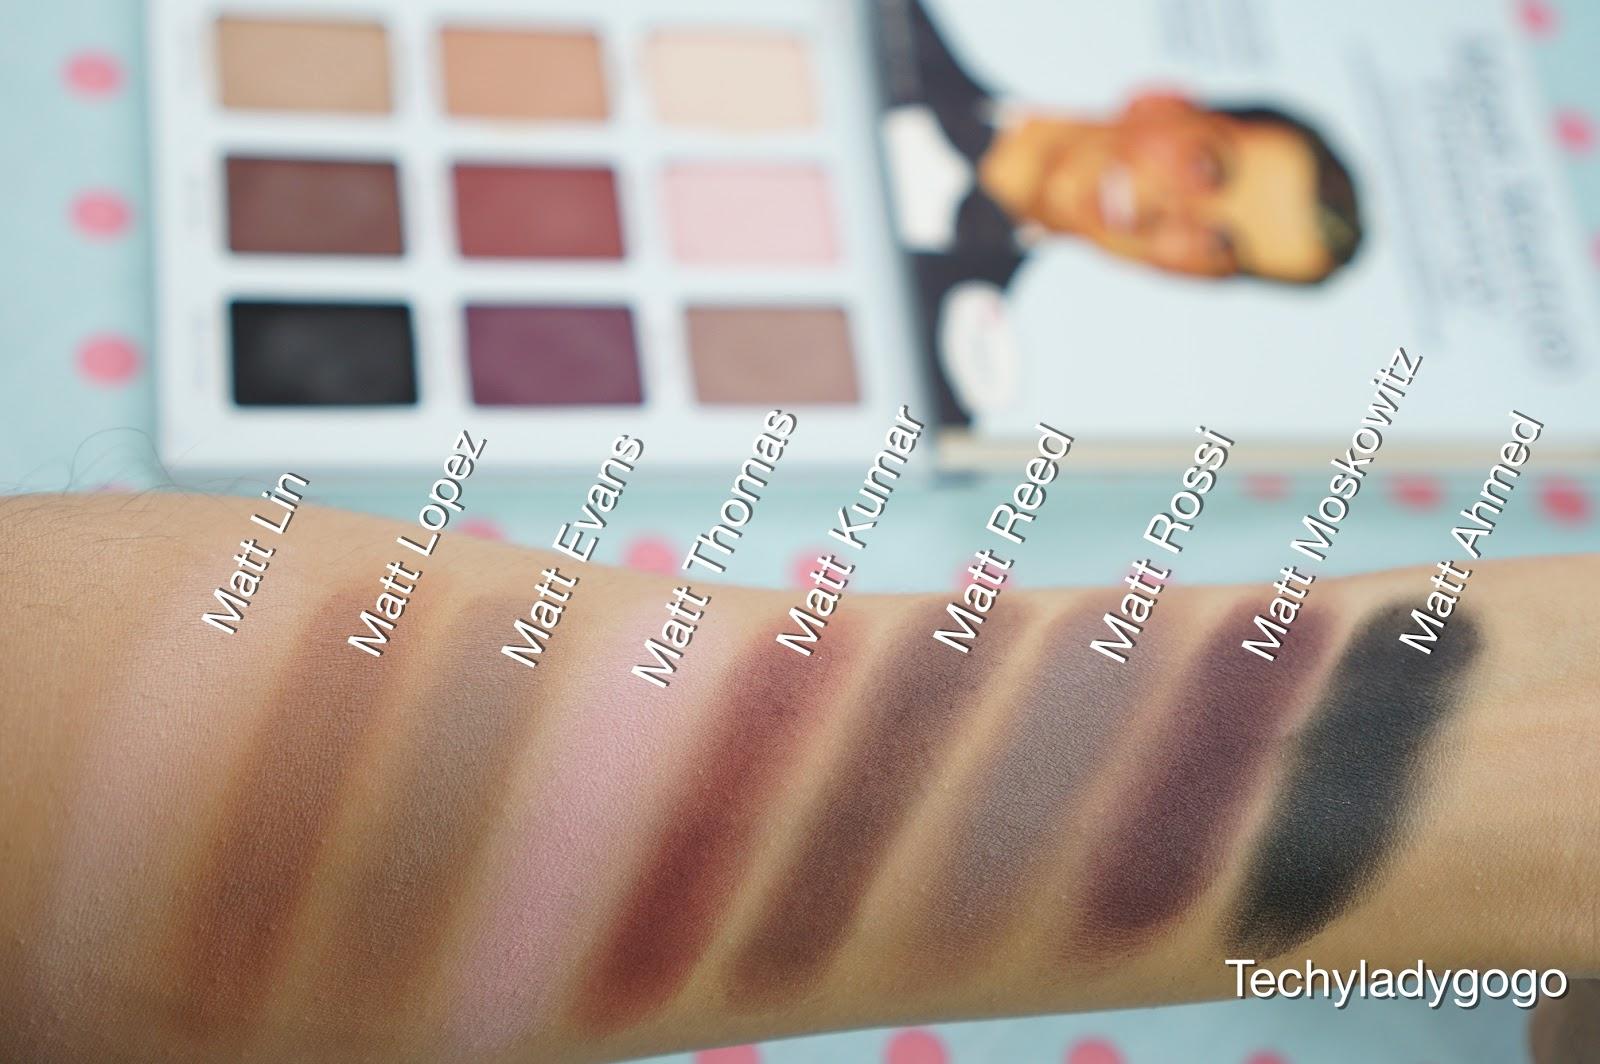 The Balm Meet Matte TRIMONY Swatch รีวิวอายชาโดว์พาเลท eyeshadow palette เนื้อแมตท์ใหม่ 9 โทนสี